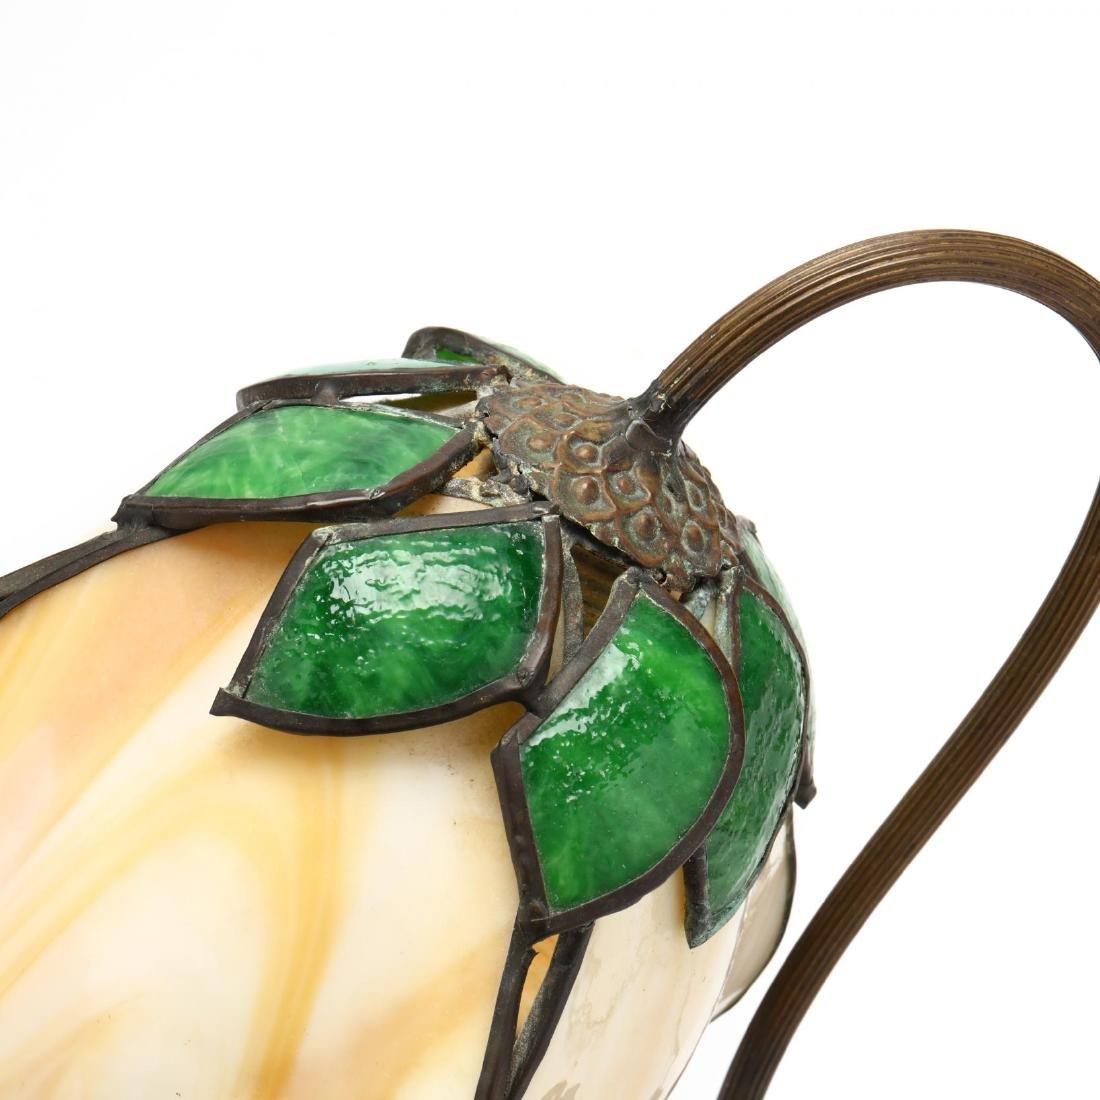 Vintage Slag Glass Tulip Form Table Lamp - 2